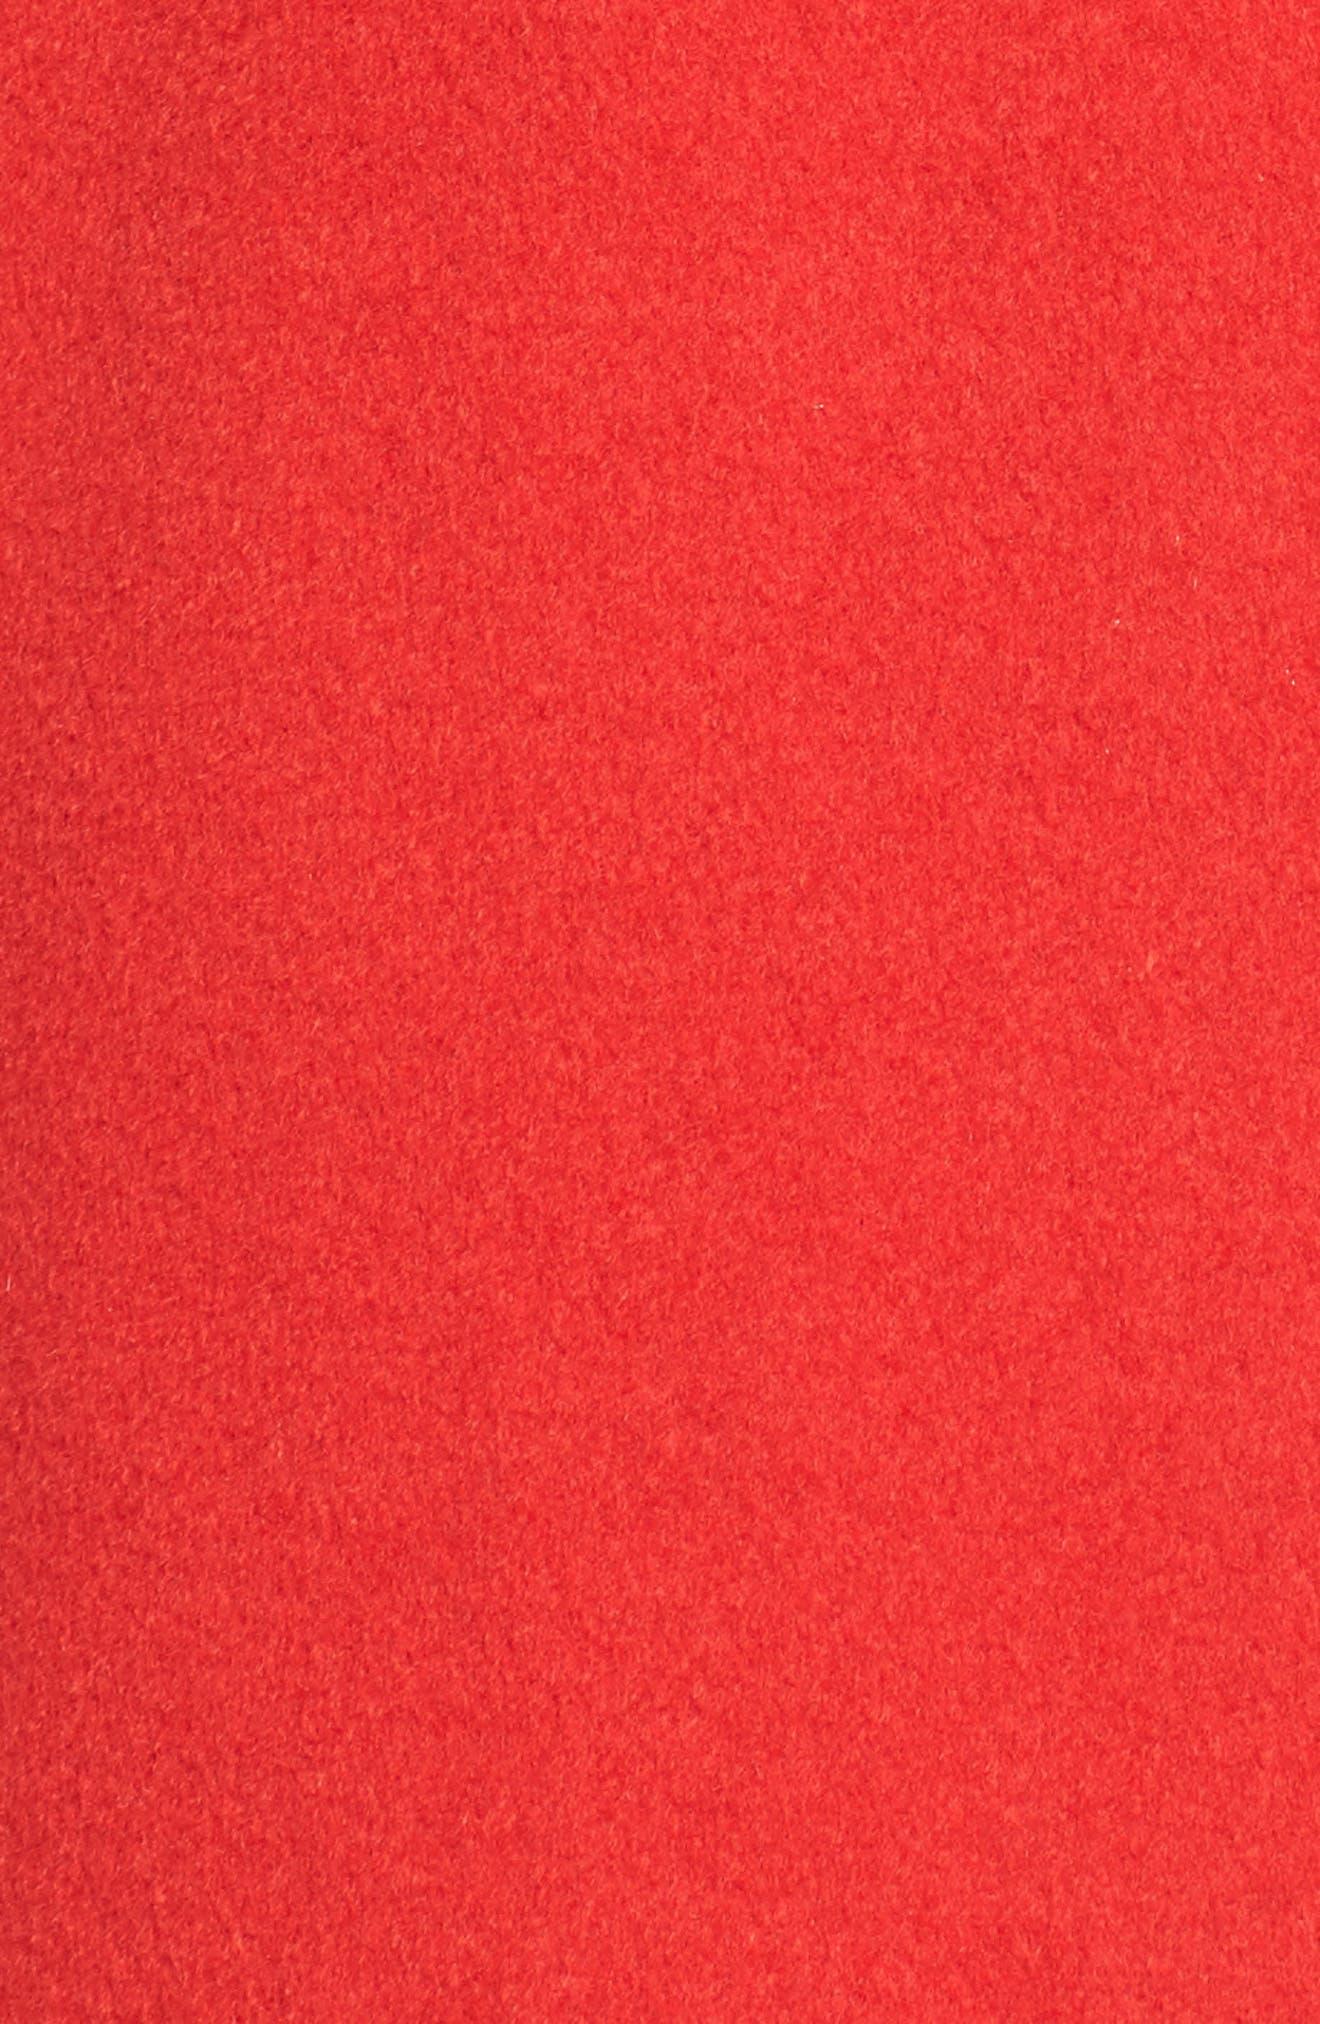 Wool Blend Coat,                             Alternate thumbnail 5, color,                             Red